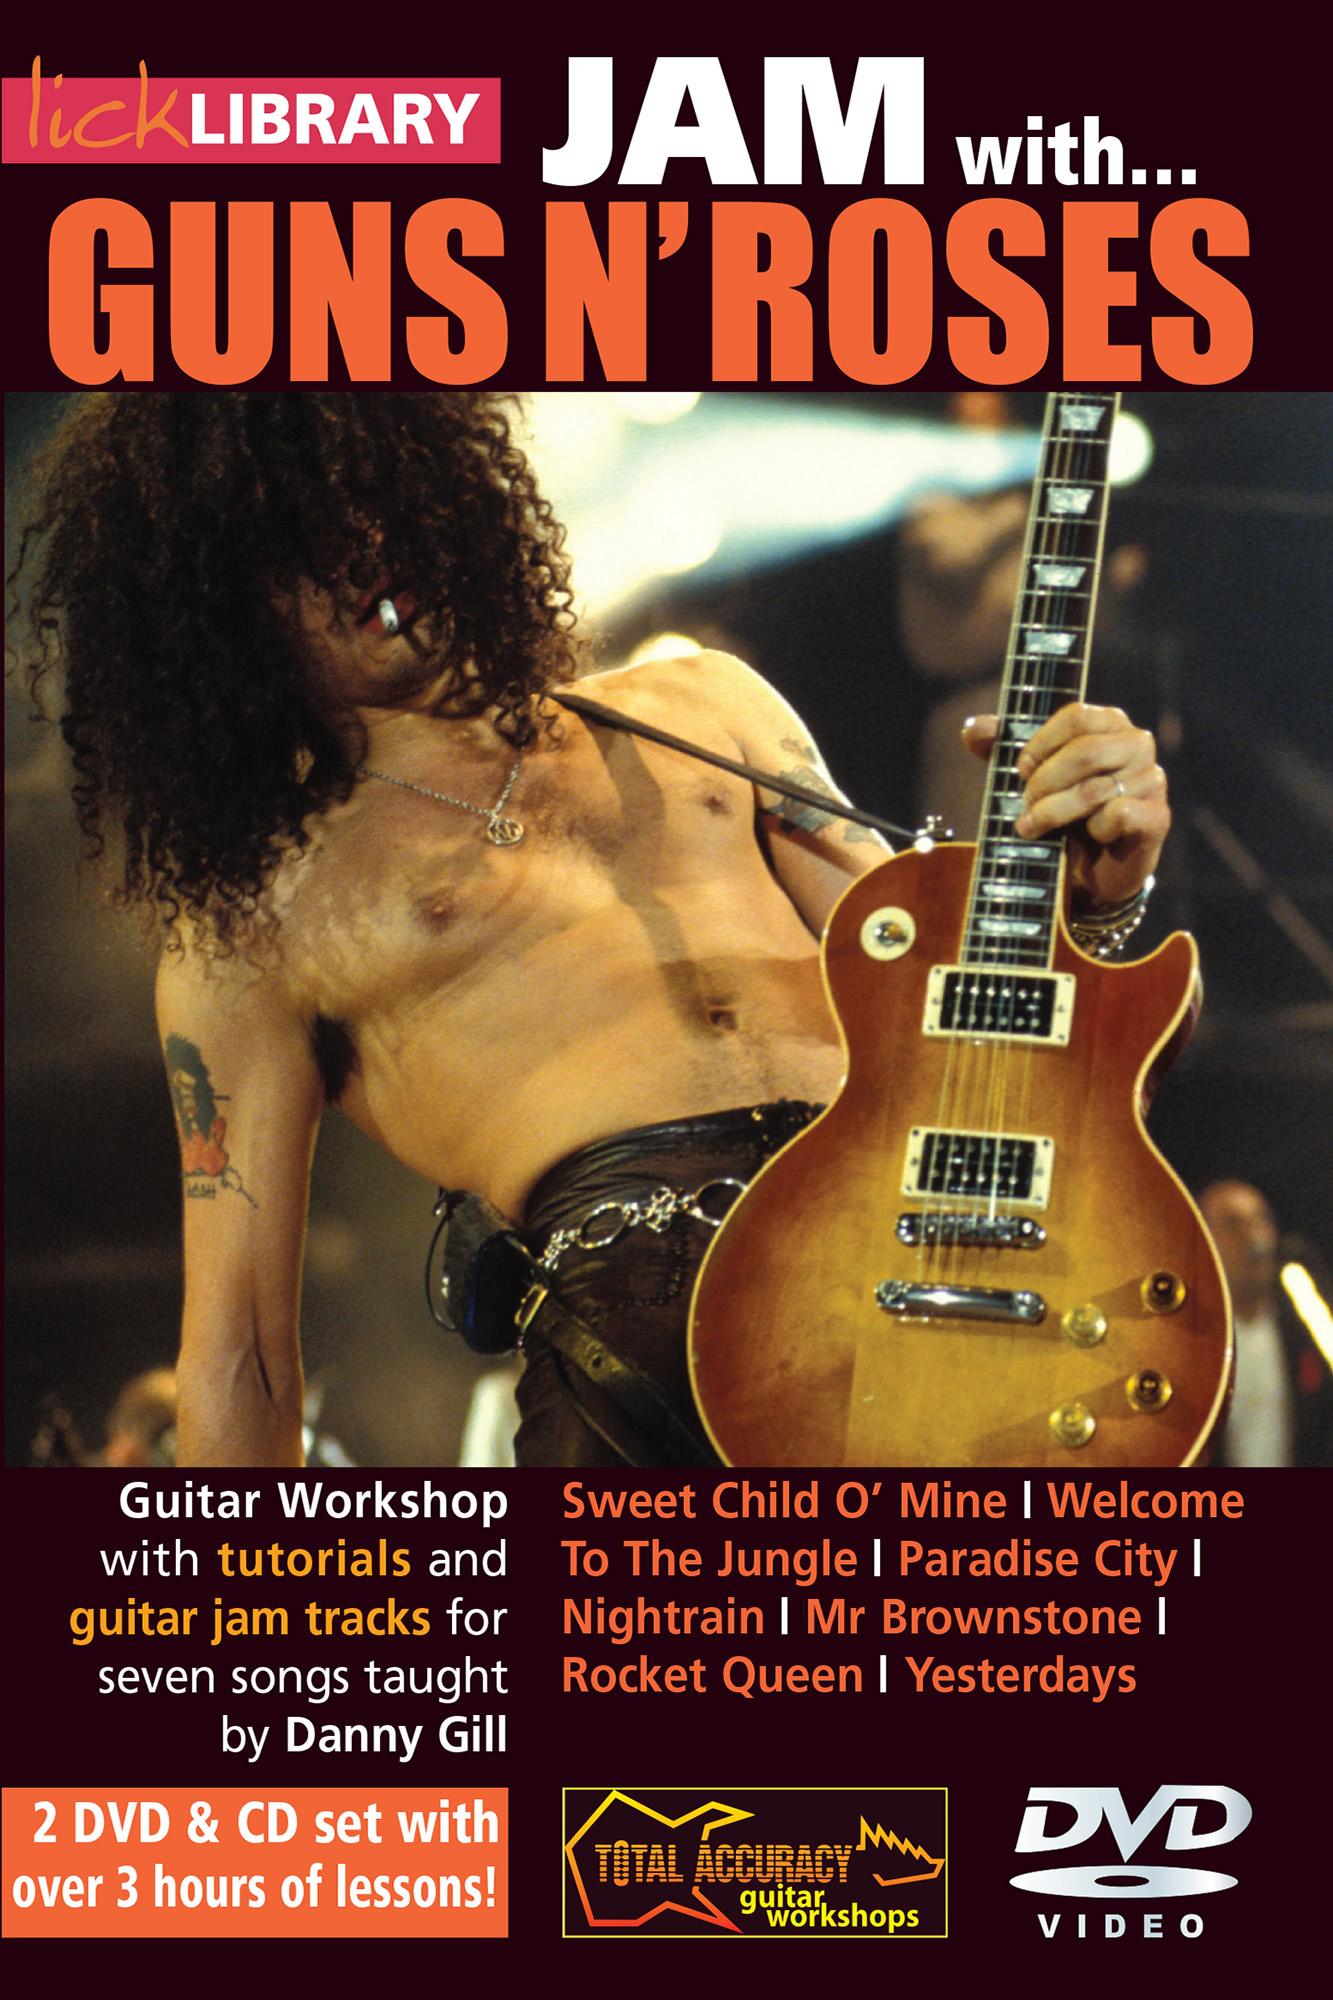 Jam With Guns N' Roses